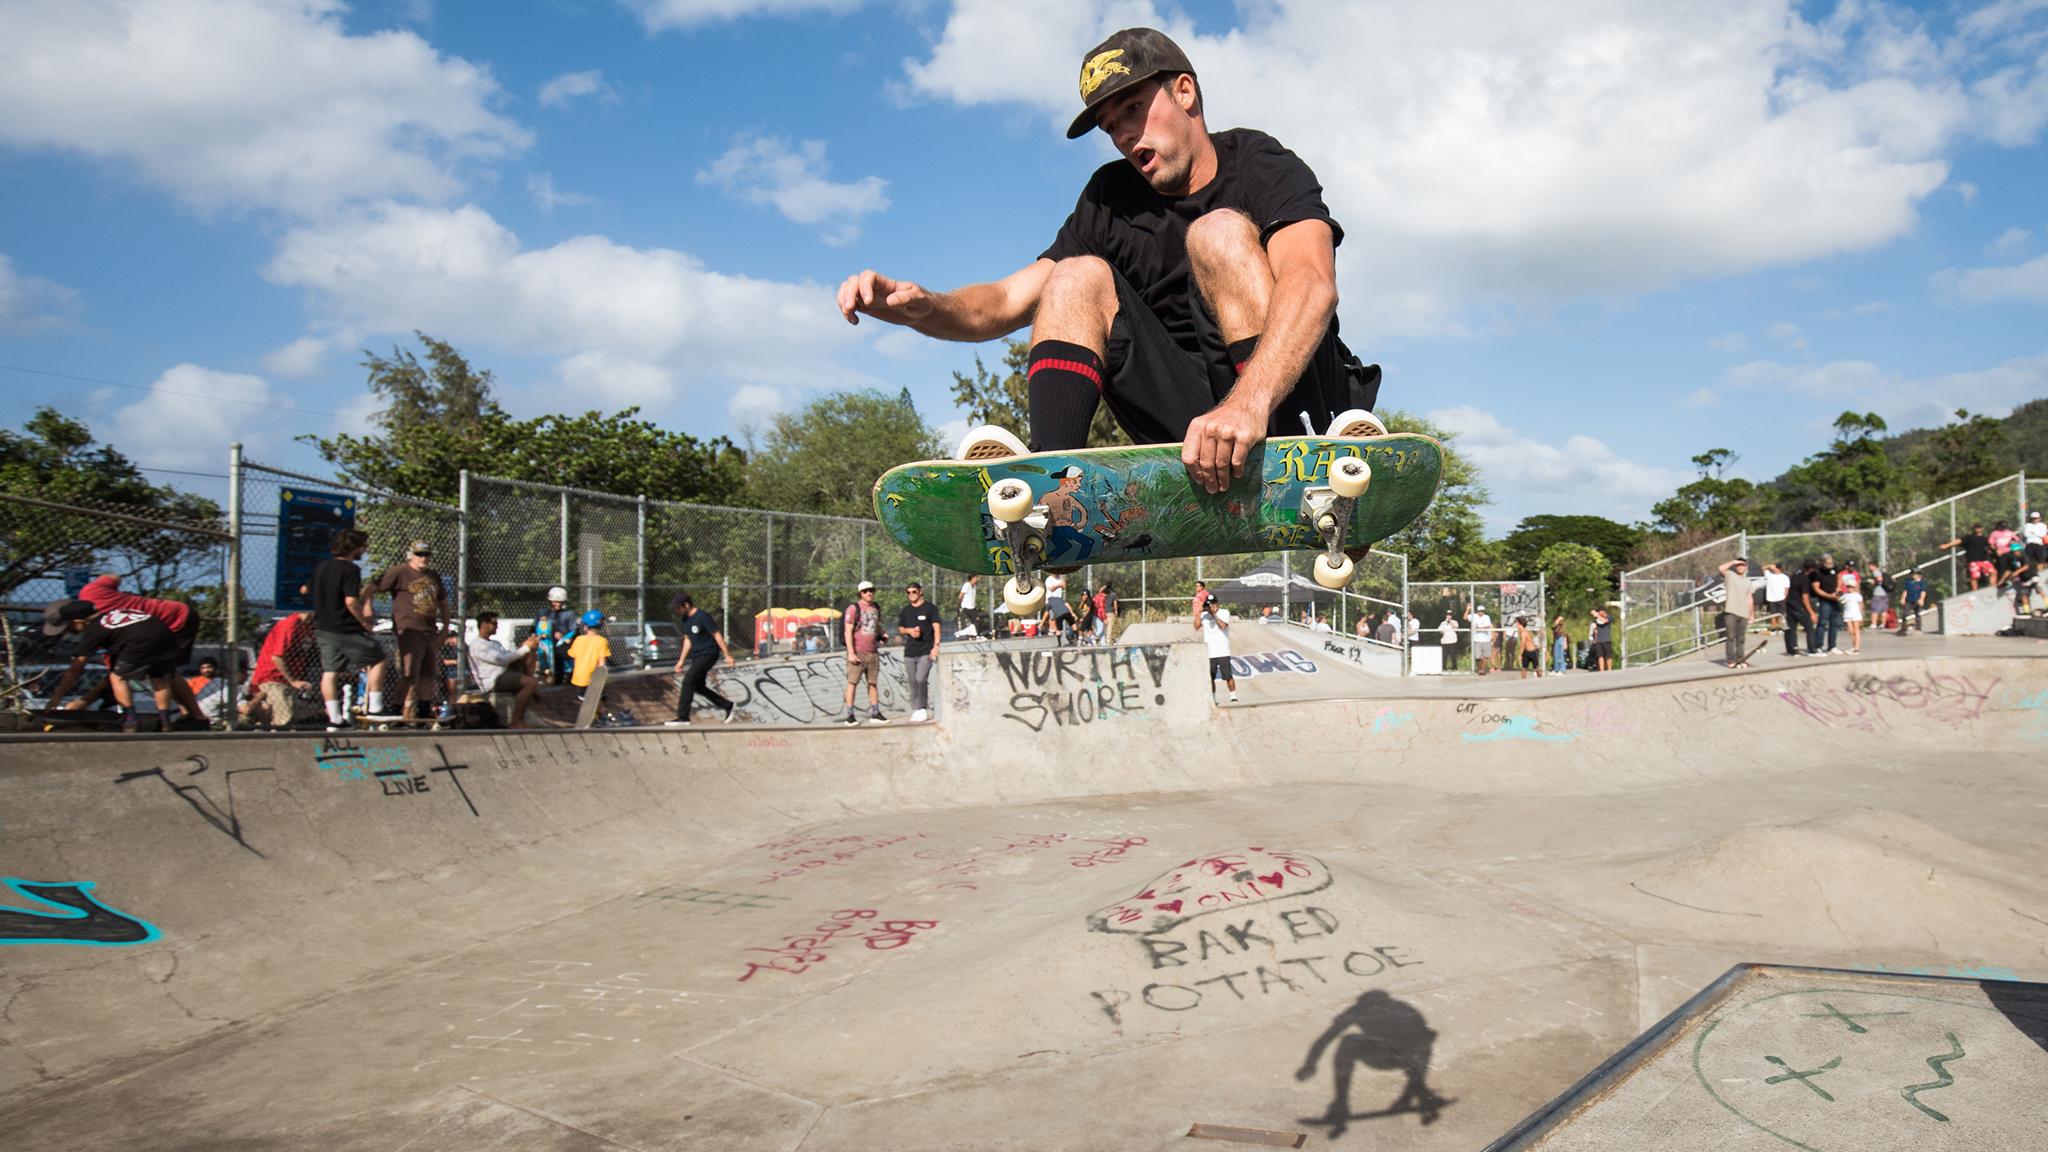 c291b274e469b5 No skateboarding allowed-No skateboarding allowed